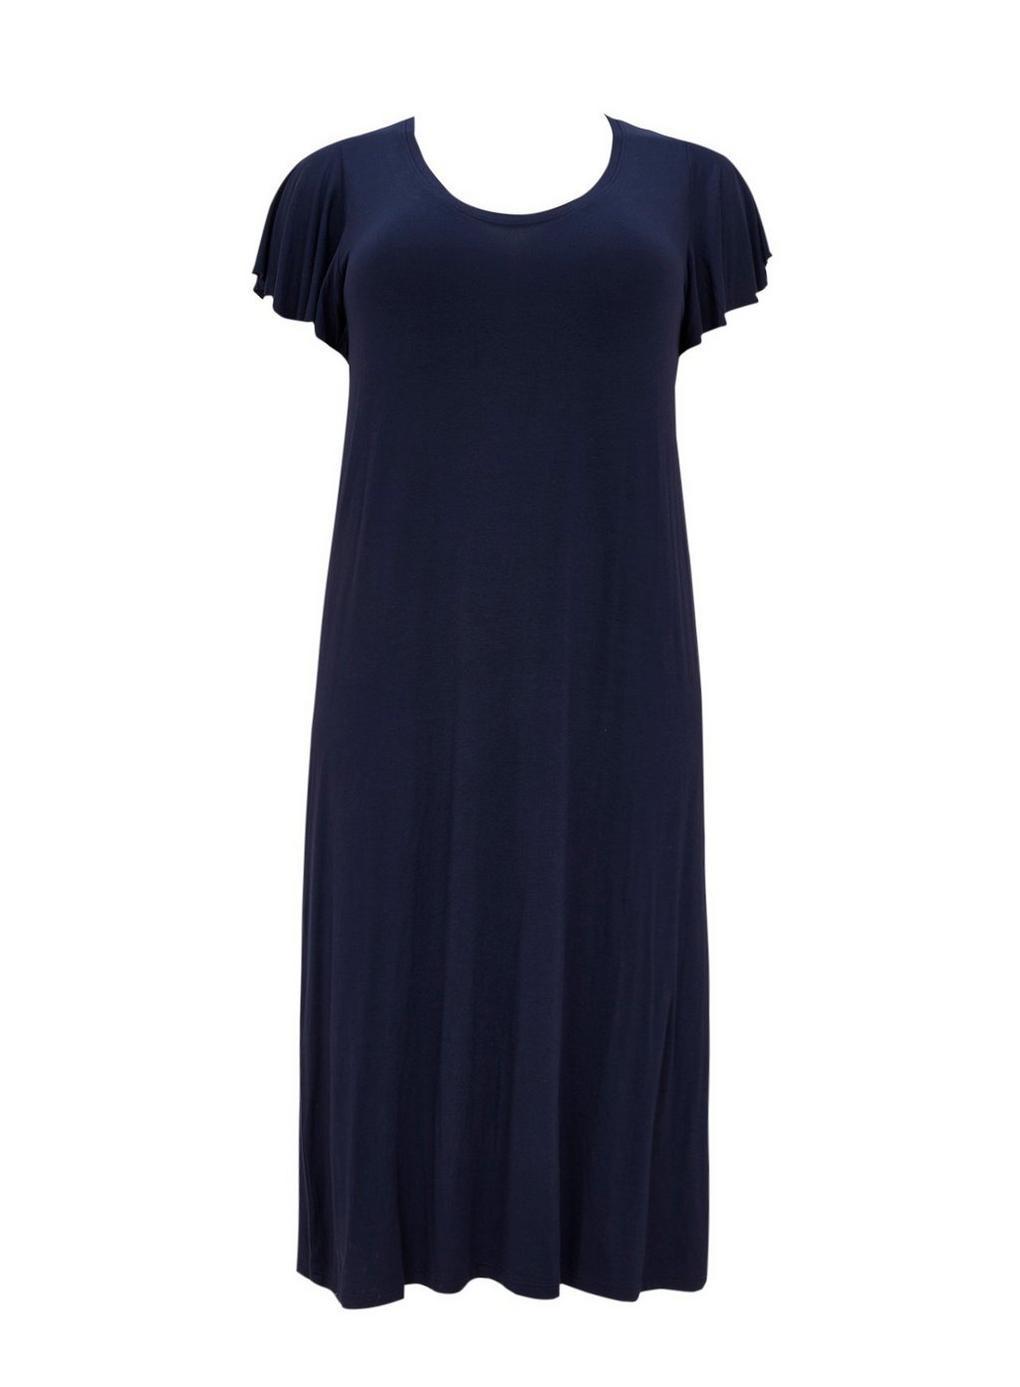 86e4896c6a Evans Navy Blue Midi Nightdress in Blue - Lyst